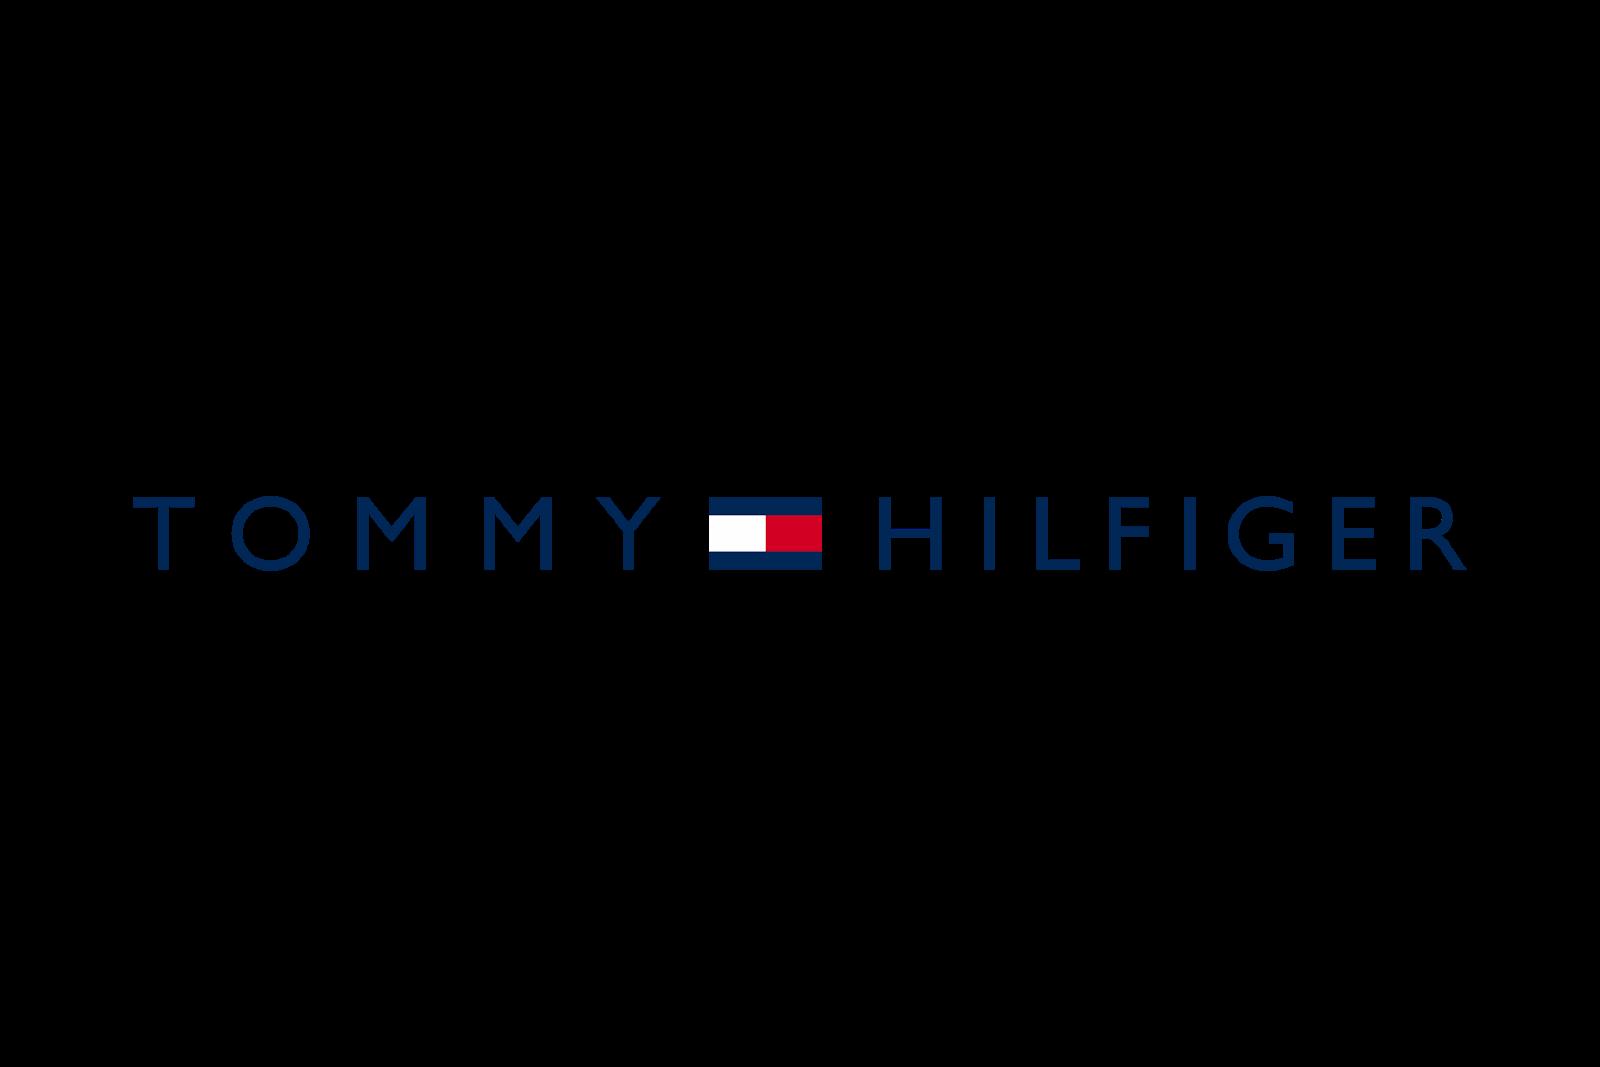 Tommy-Hilfiger logo